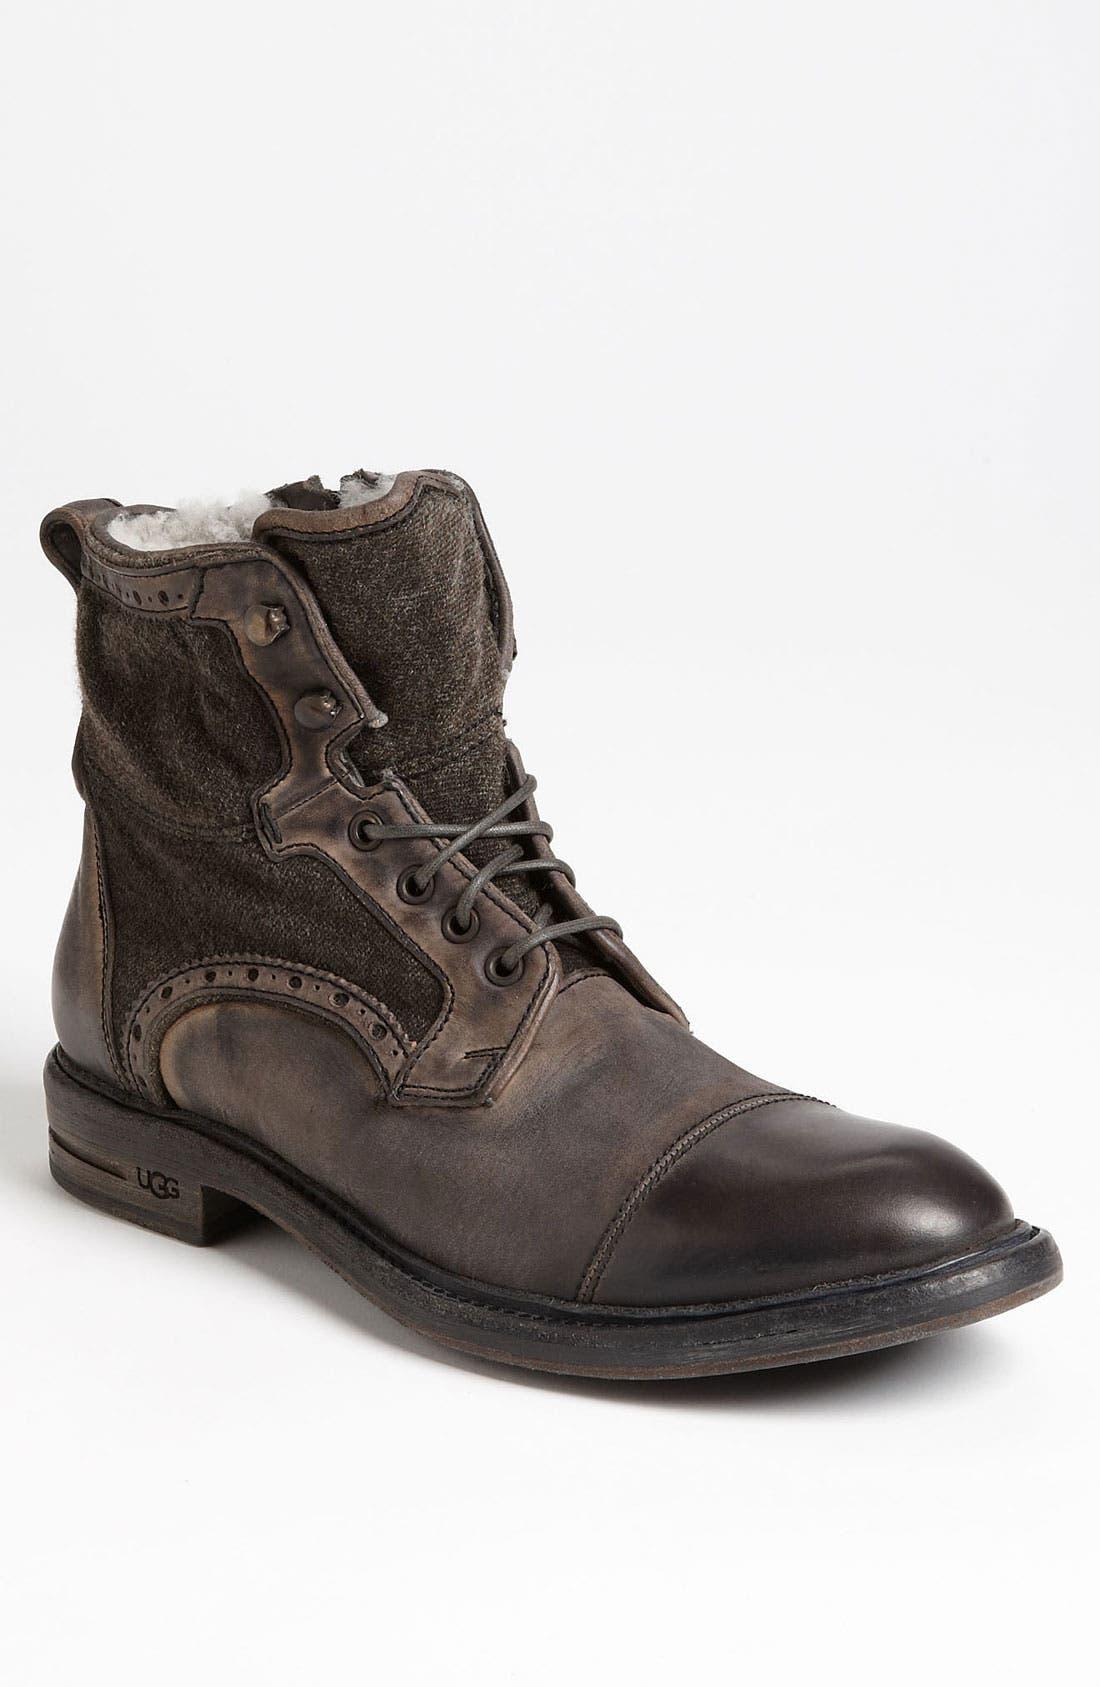 Alternate Image 1 Selected - UGG® Collection 'Malden' Cap Toe Boot (Men)